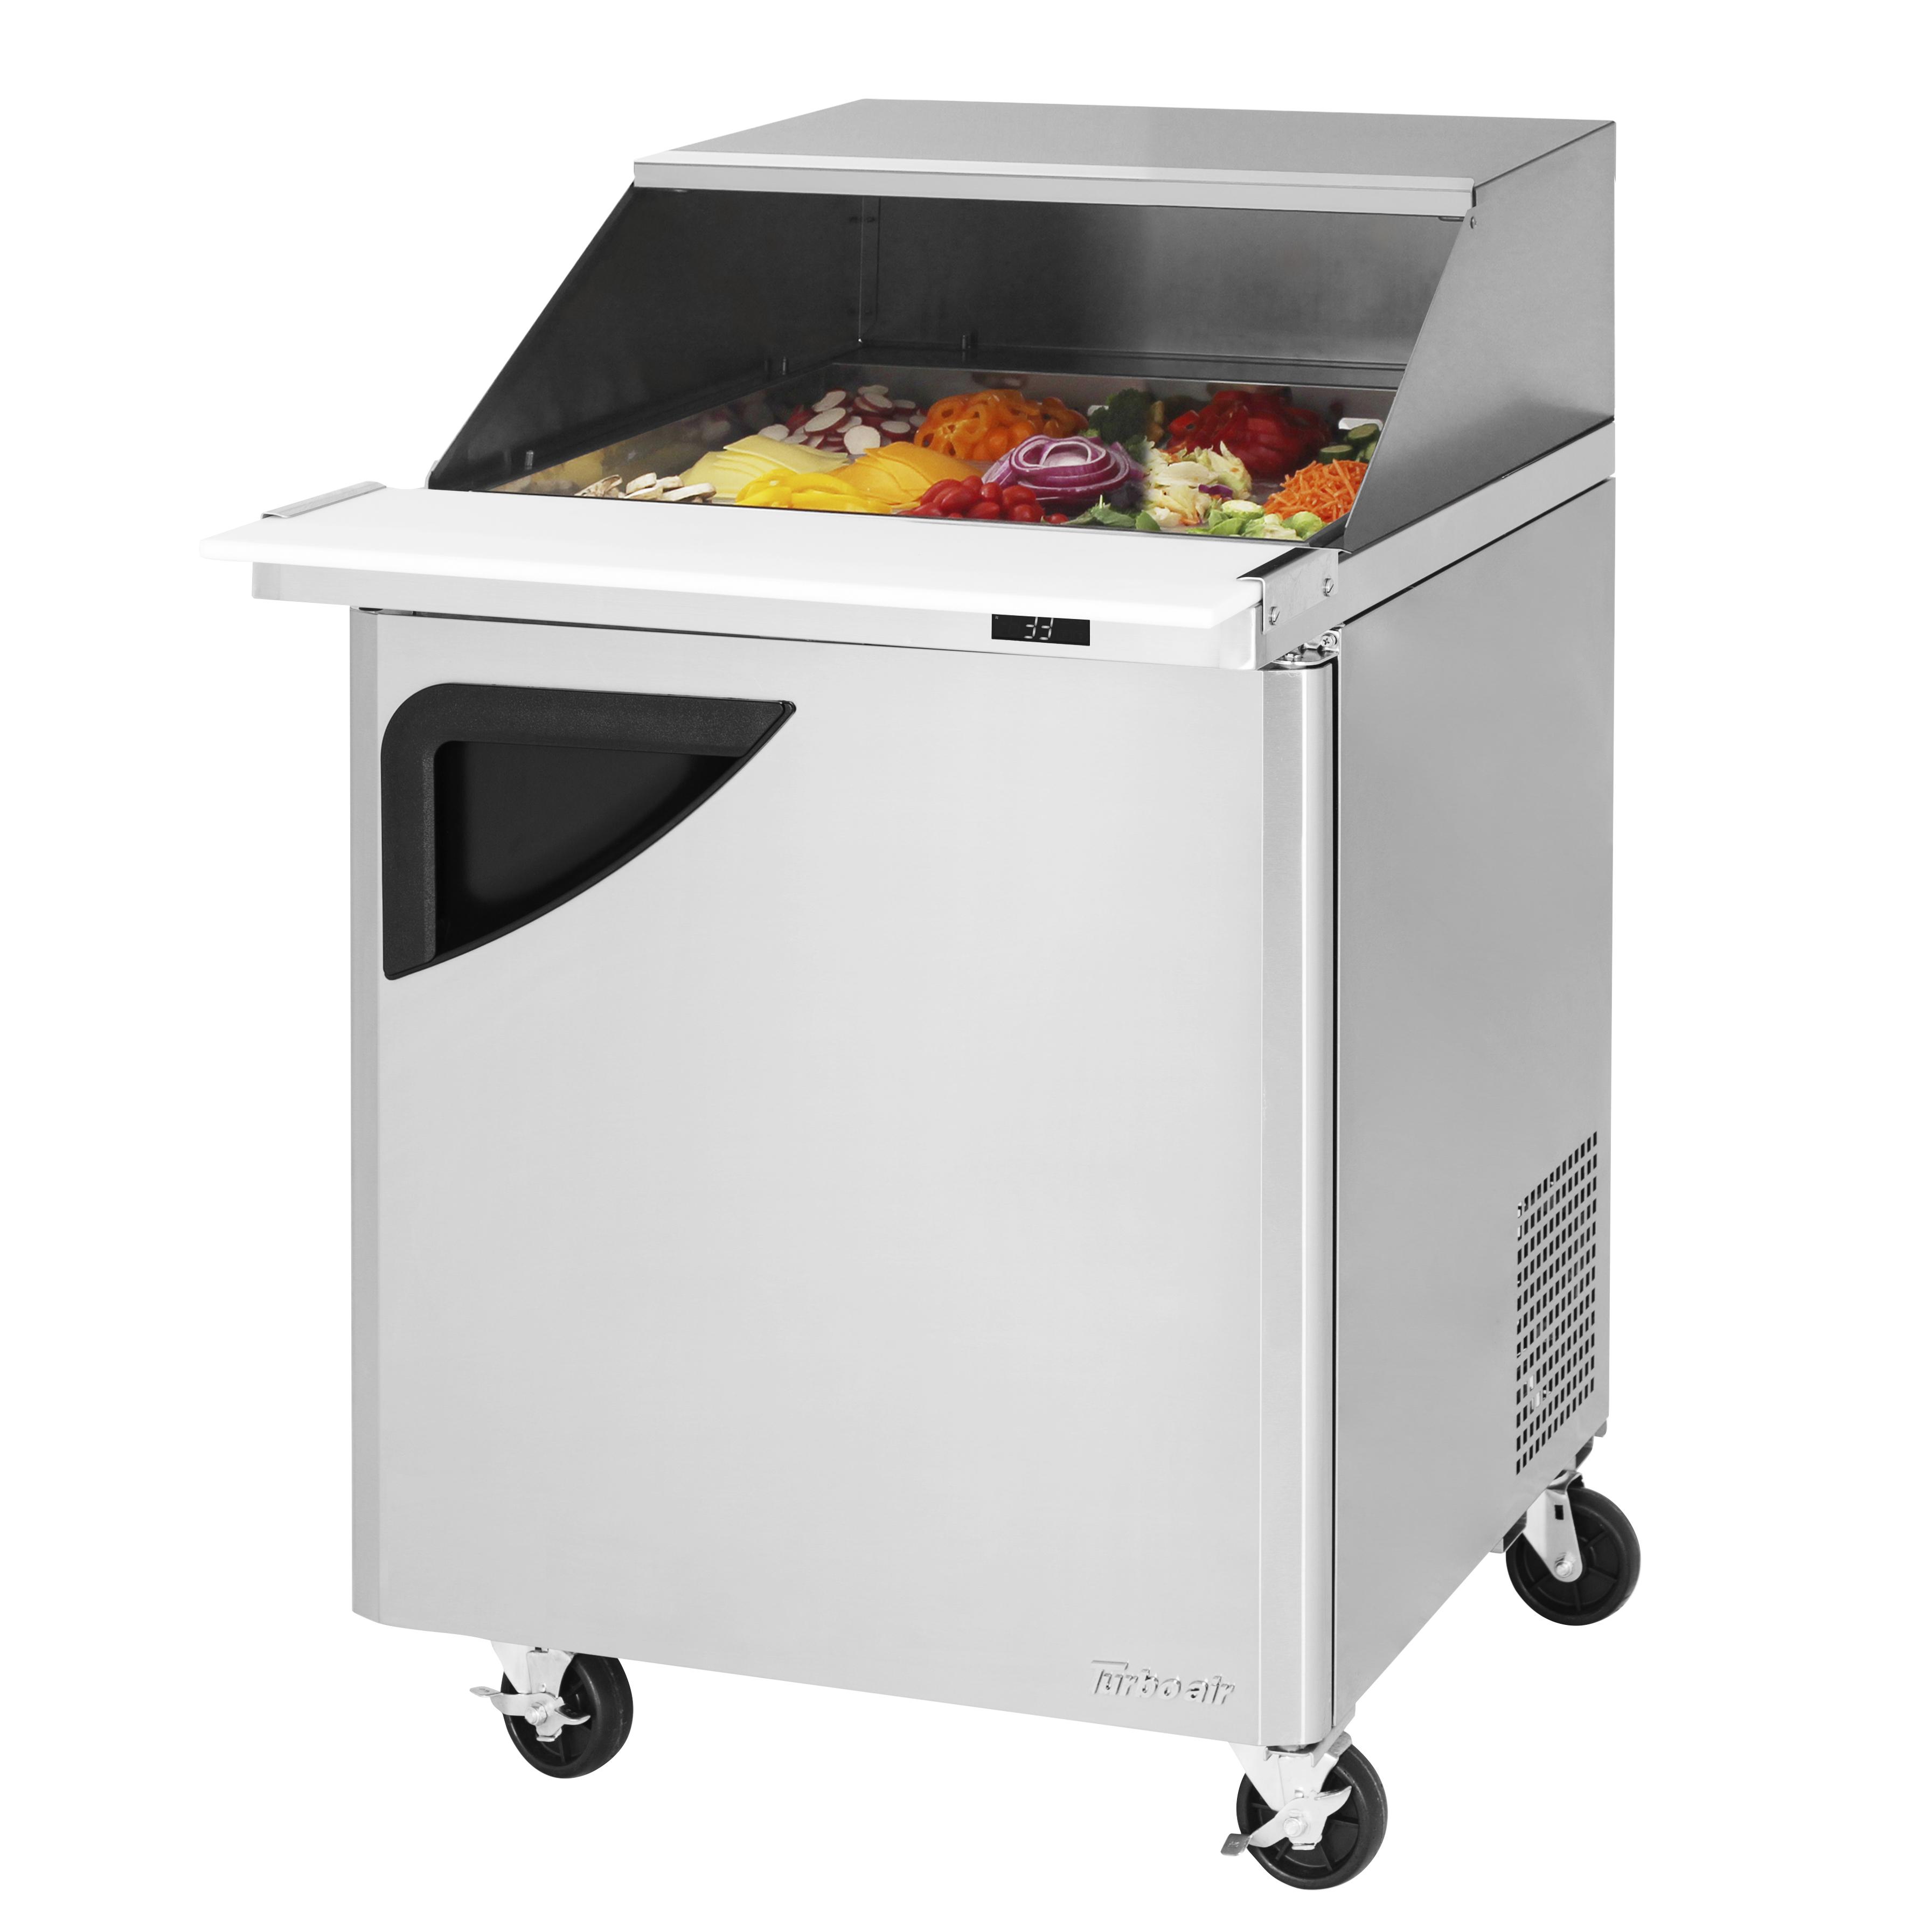 Turbo Air TST-28SD-12-N-SL refrigerated counter, mega top sandwich / salad unit